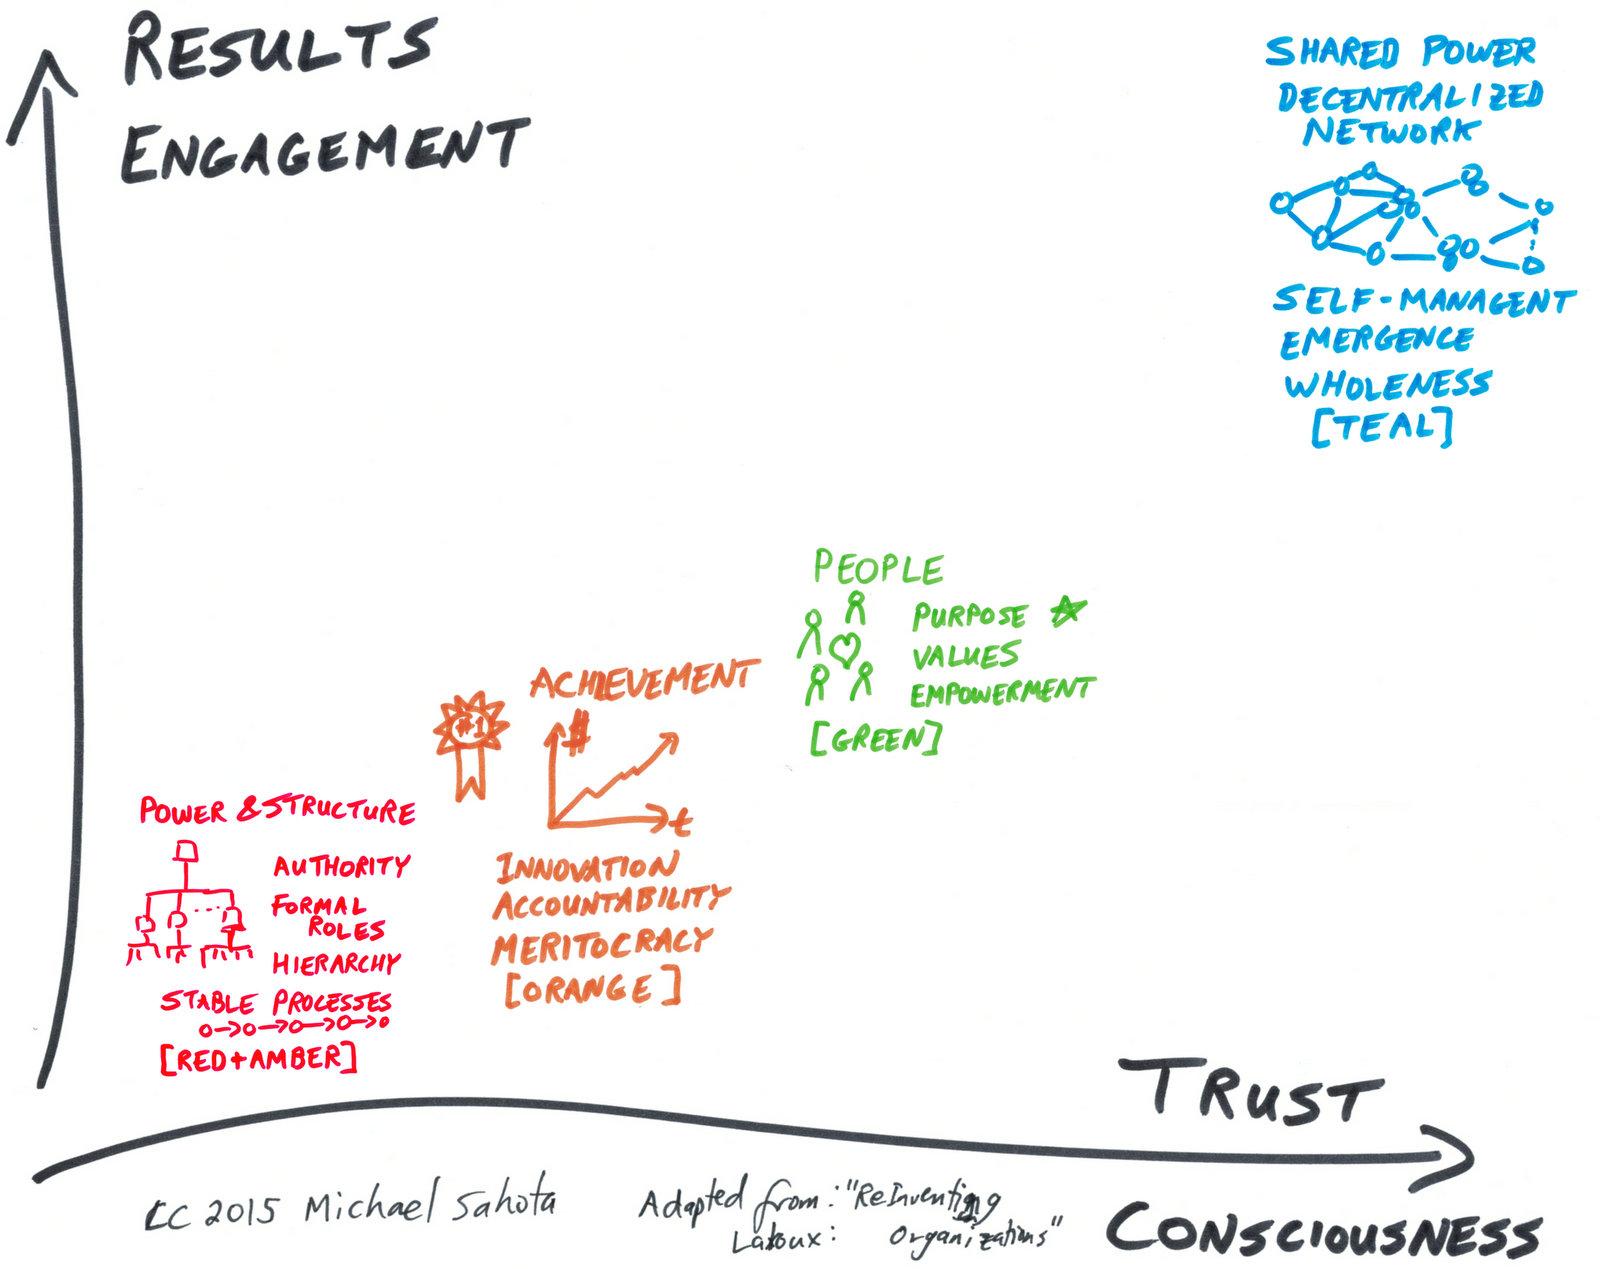 Culture Change Reinventing Organizations